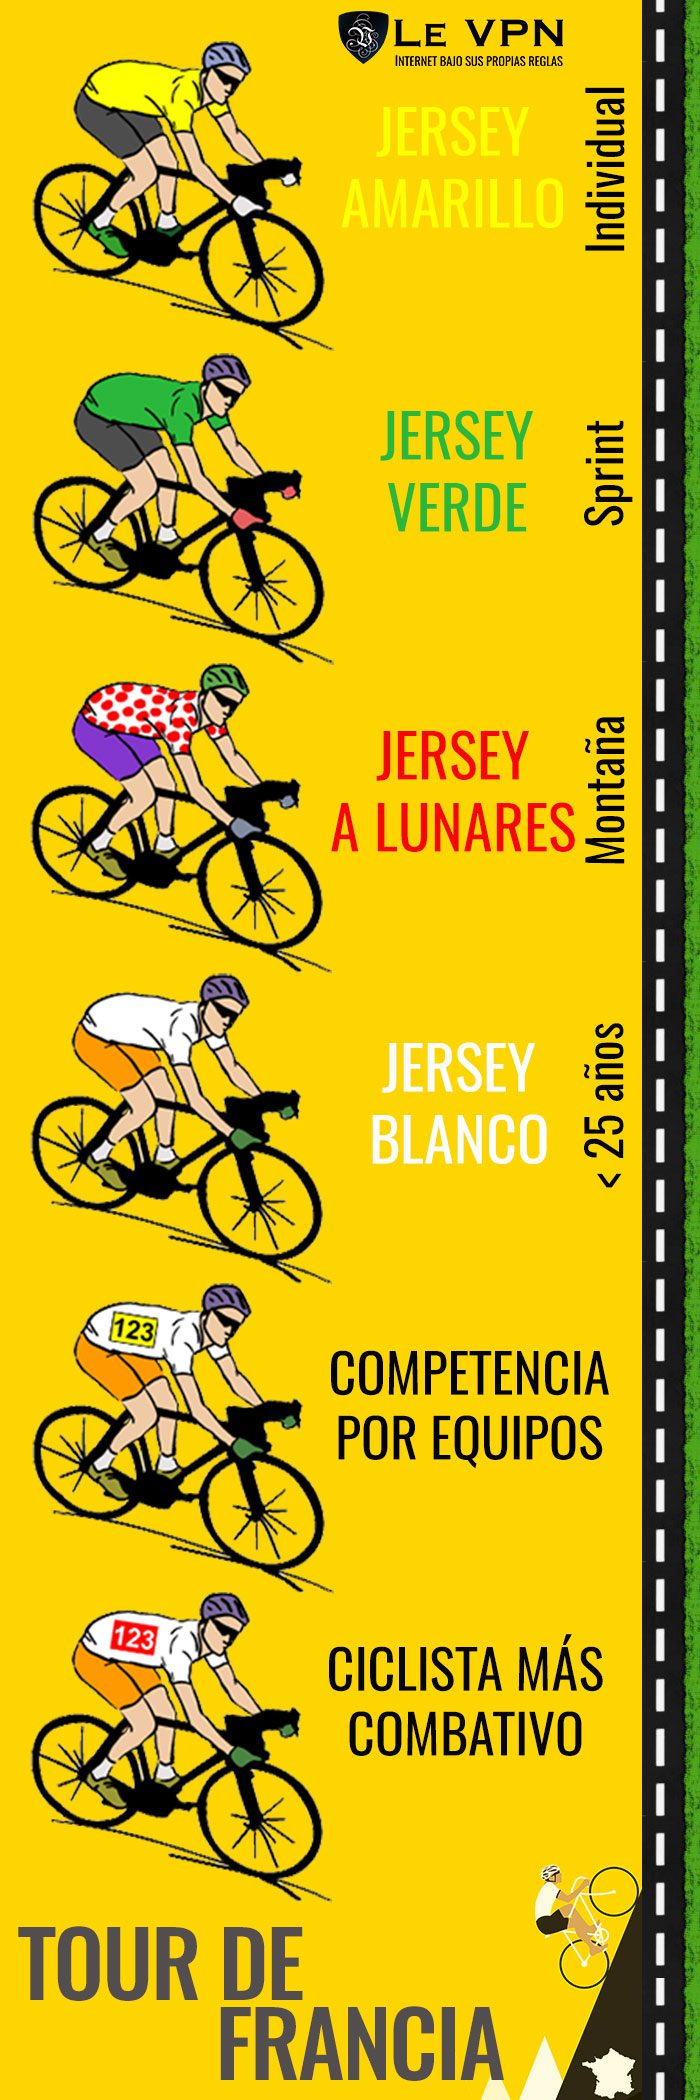 6 sub-carreras en curso del Tour de Francia   Le VPN